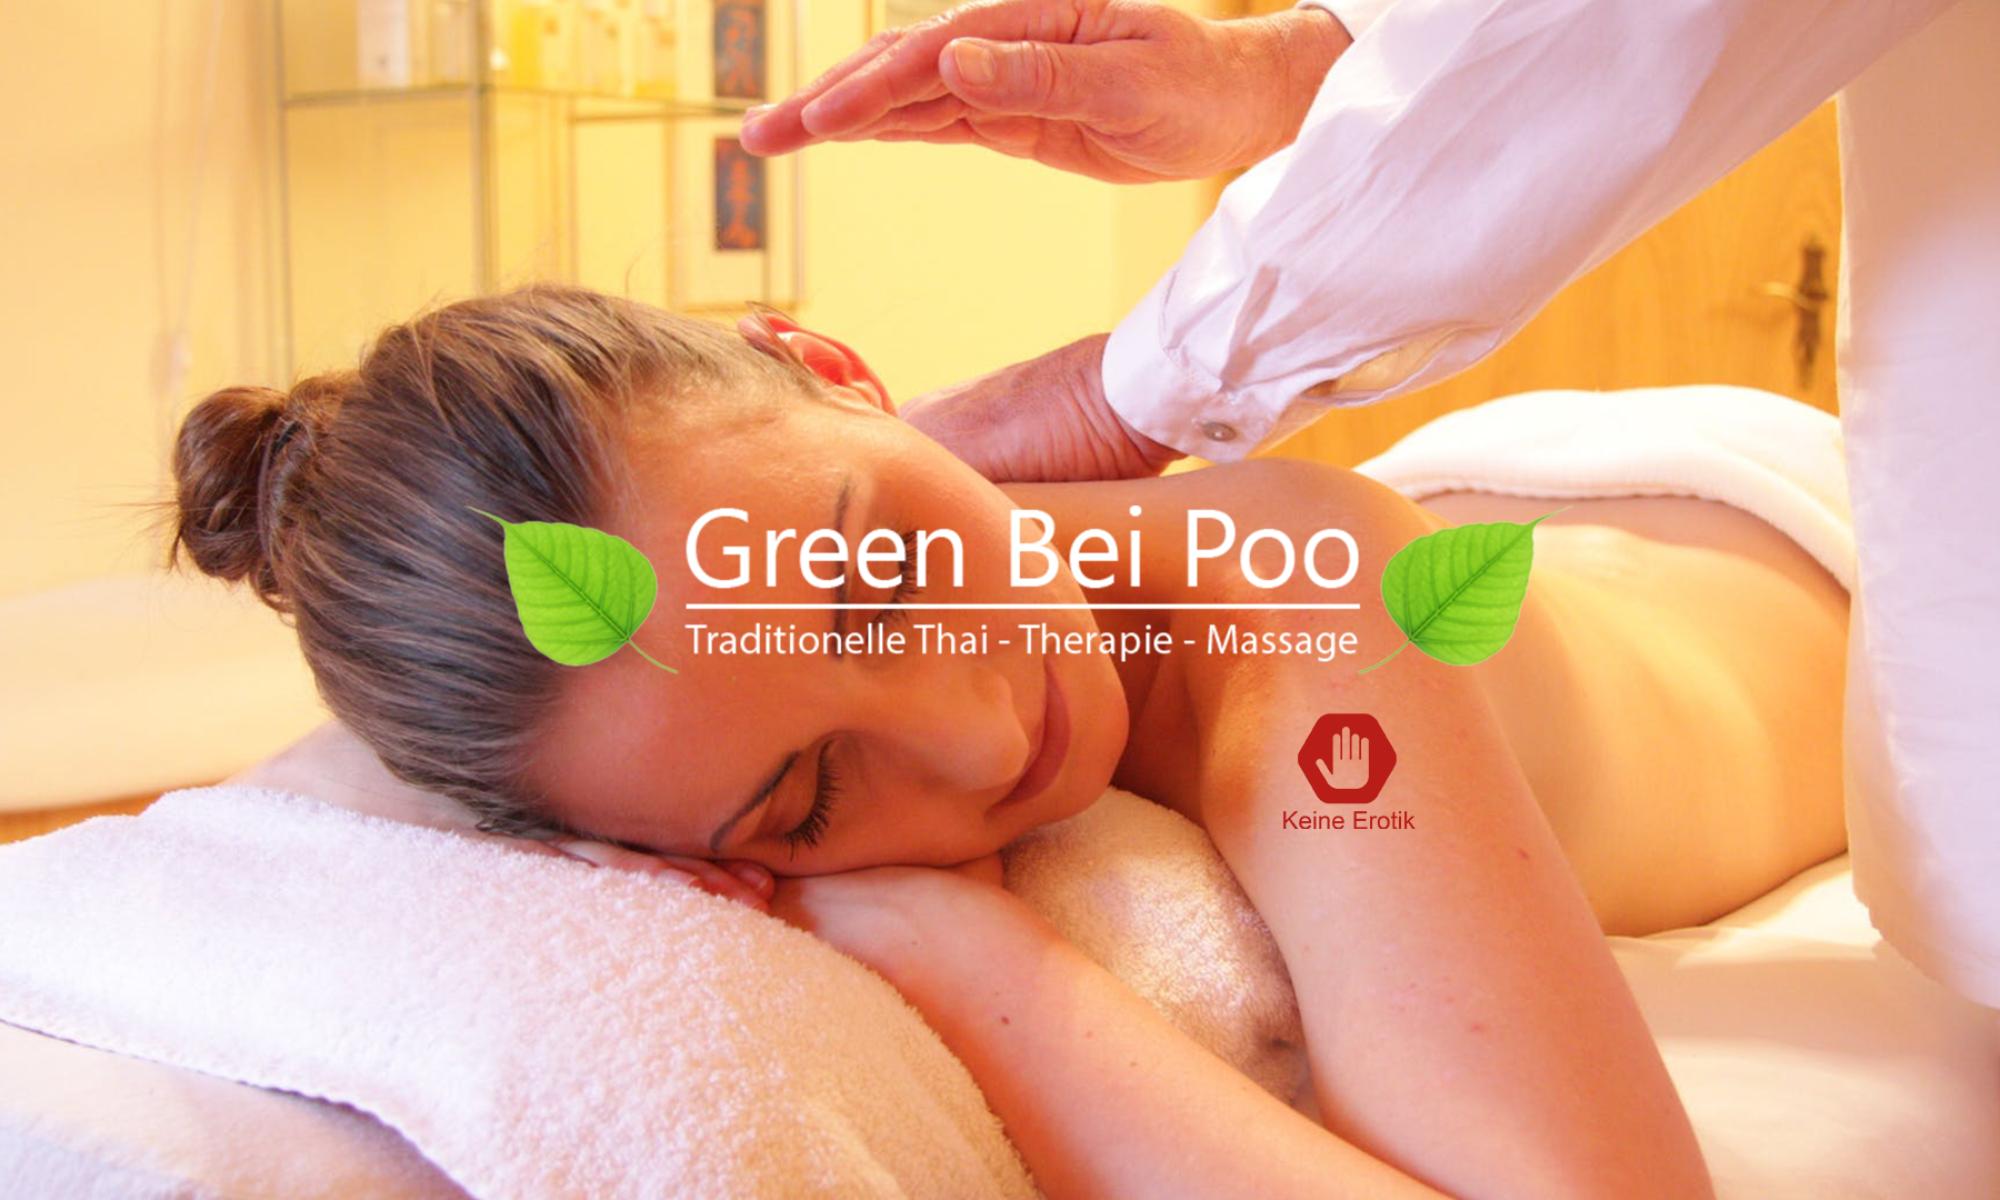 Green Bei Poo